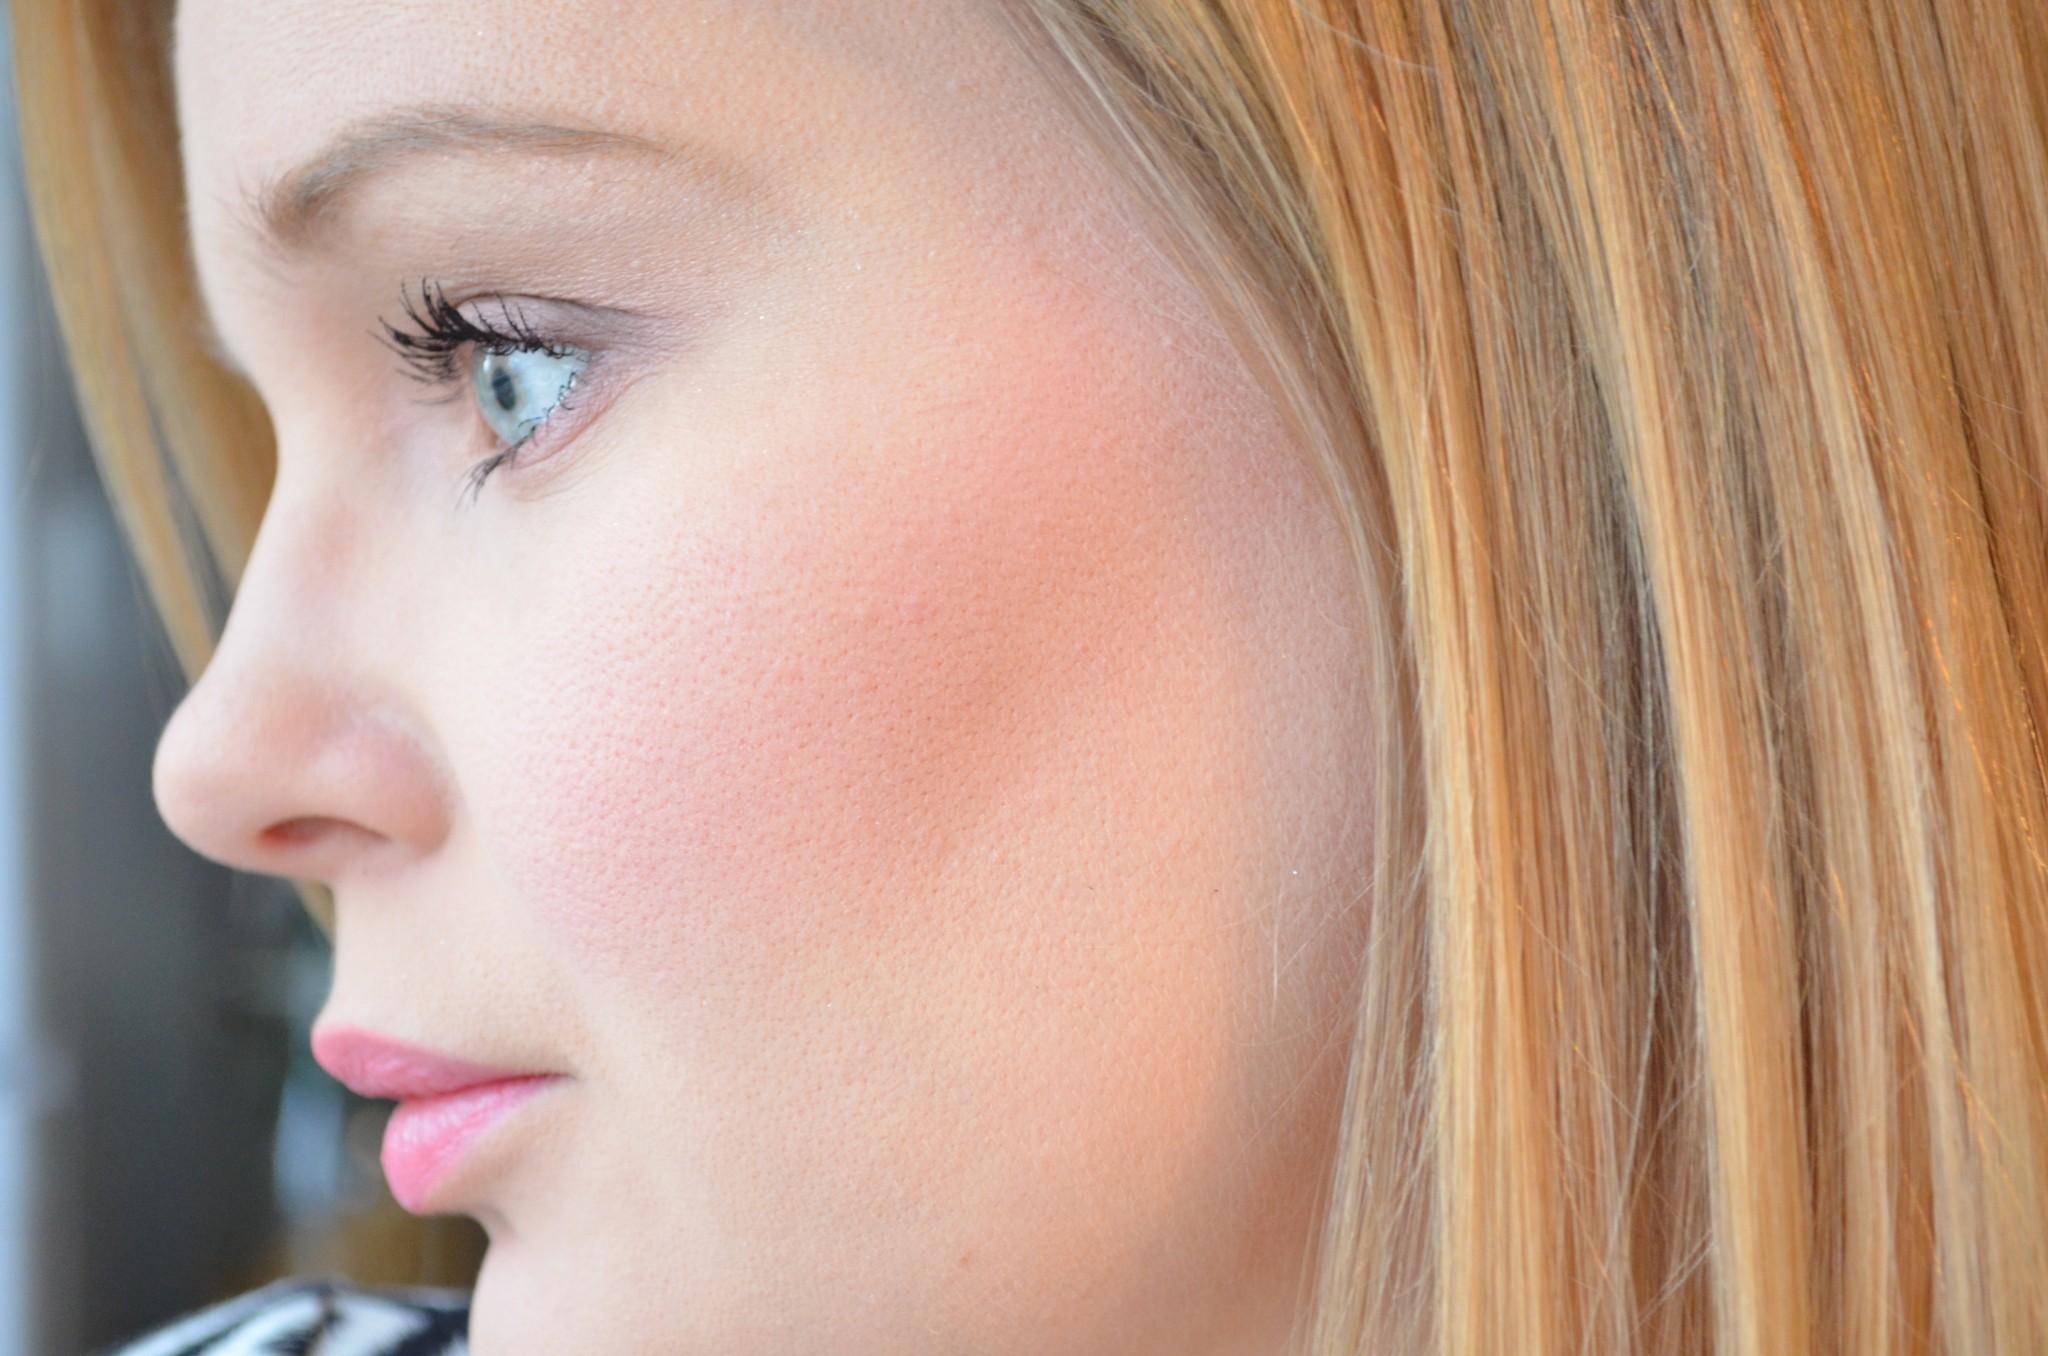 DSC 7019 1 - Nieuwe Inglot Freedom System Eyeshadow + Blush